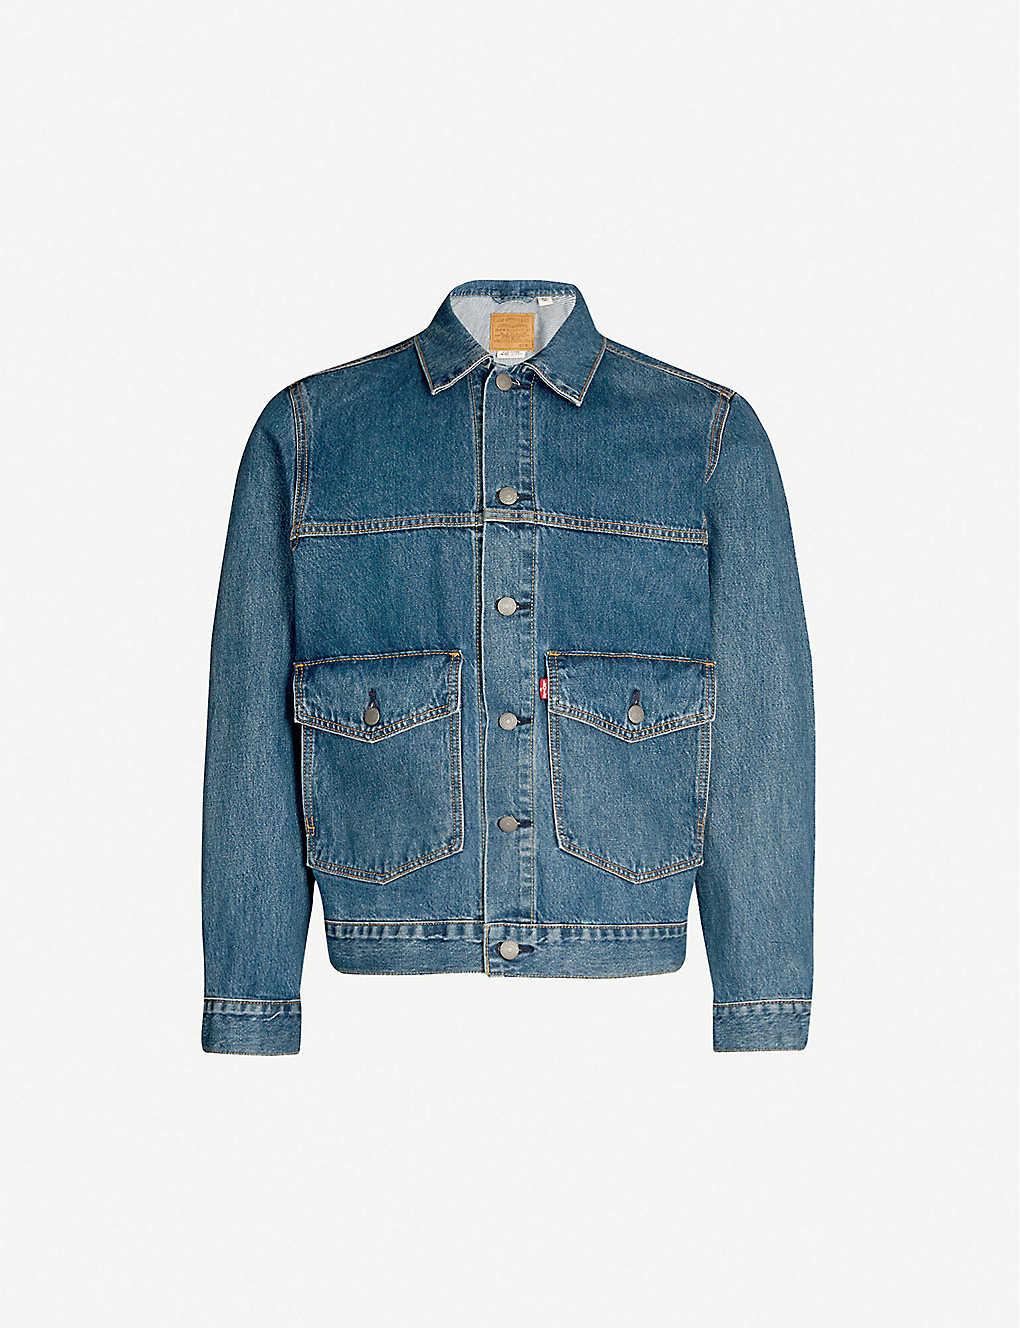 1fcbe799 LEVIS - Patch pocket denim trucker jacket | Selfridges.com